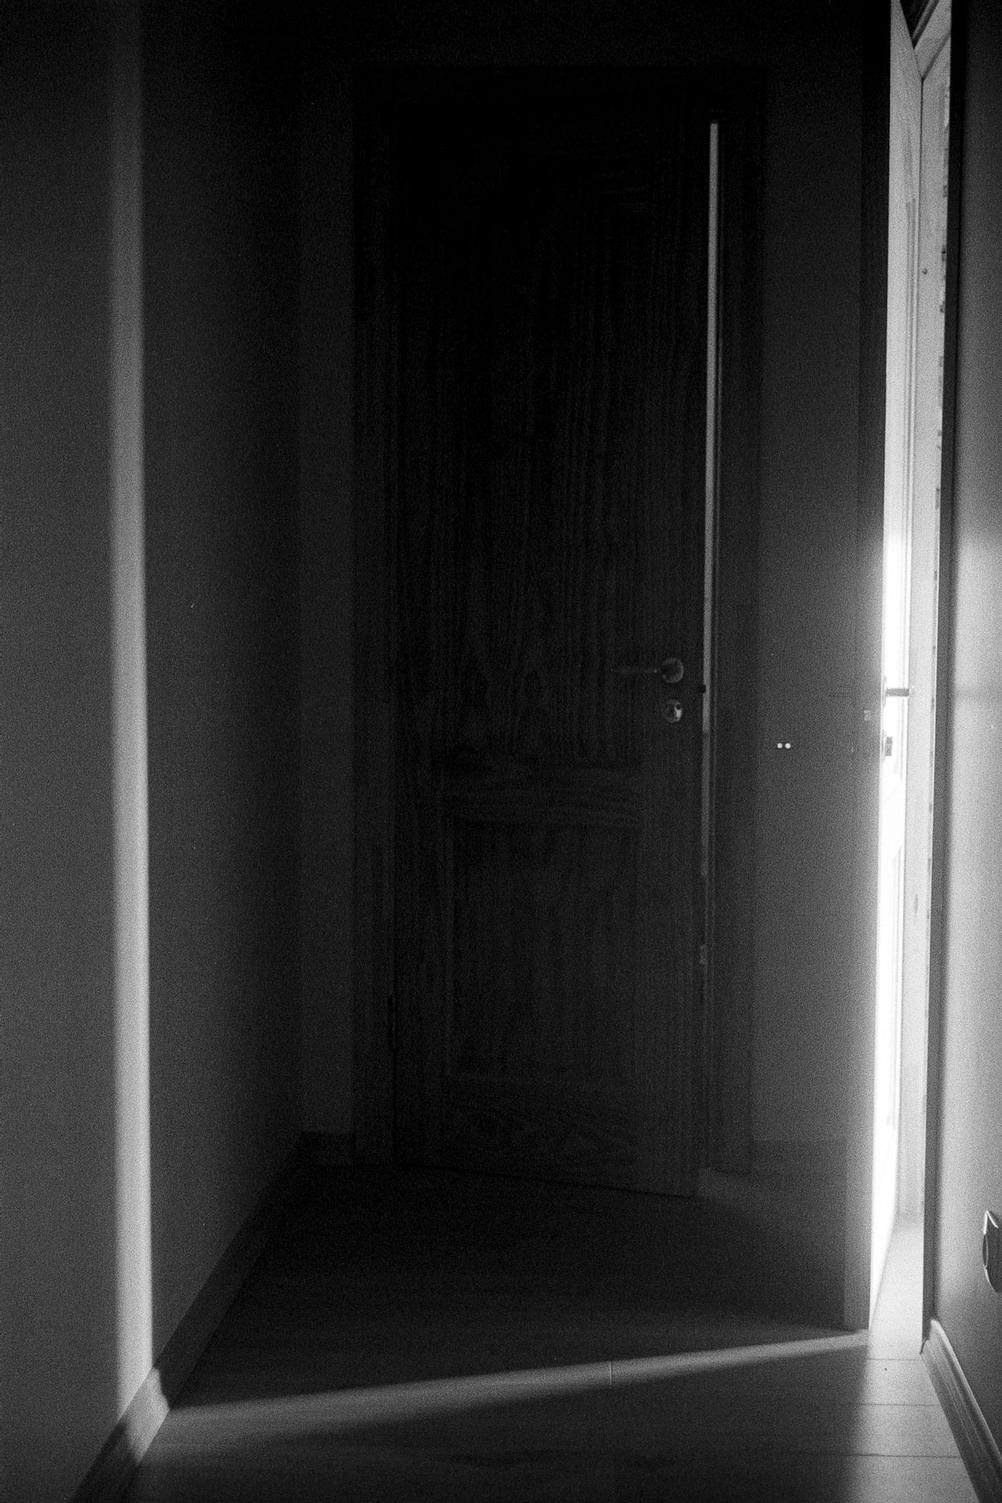 Photo light shining through a thin opening through the door.